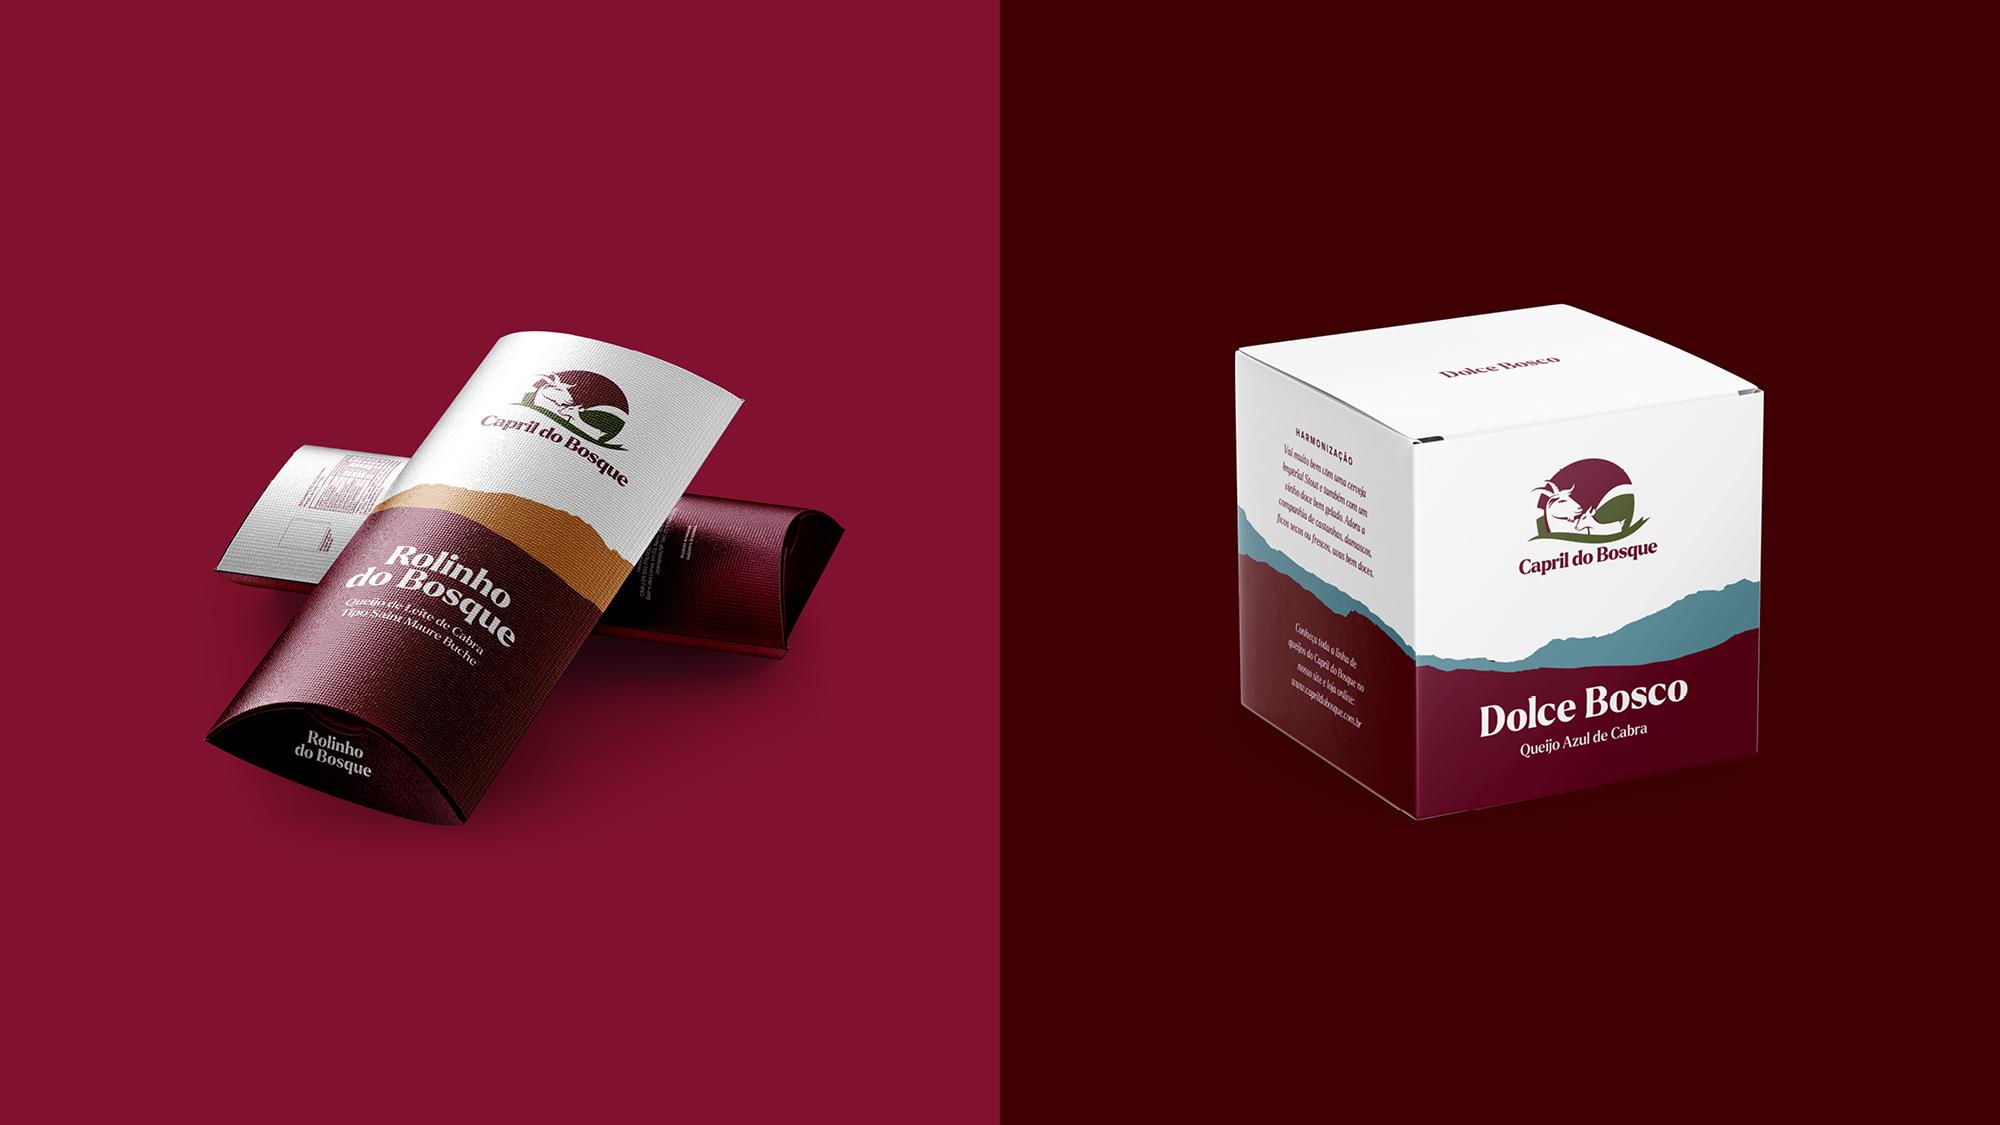 Lanatta-Branding-Capril-do-Bosque6